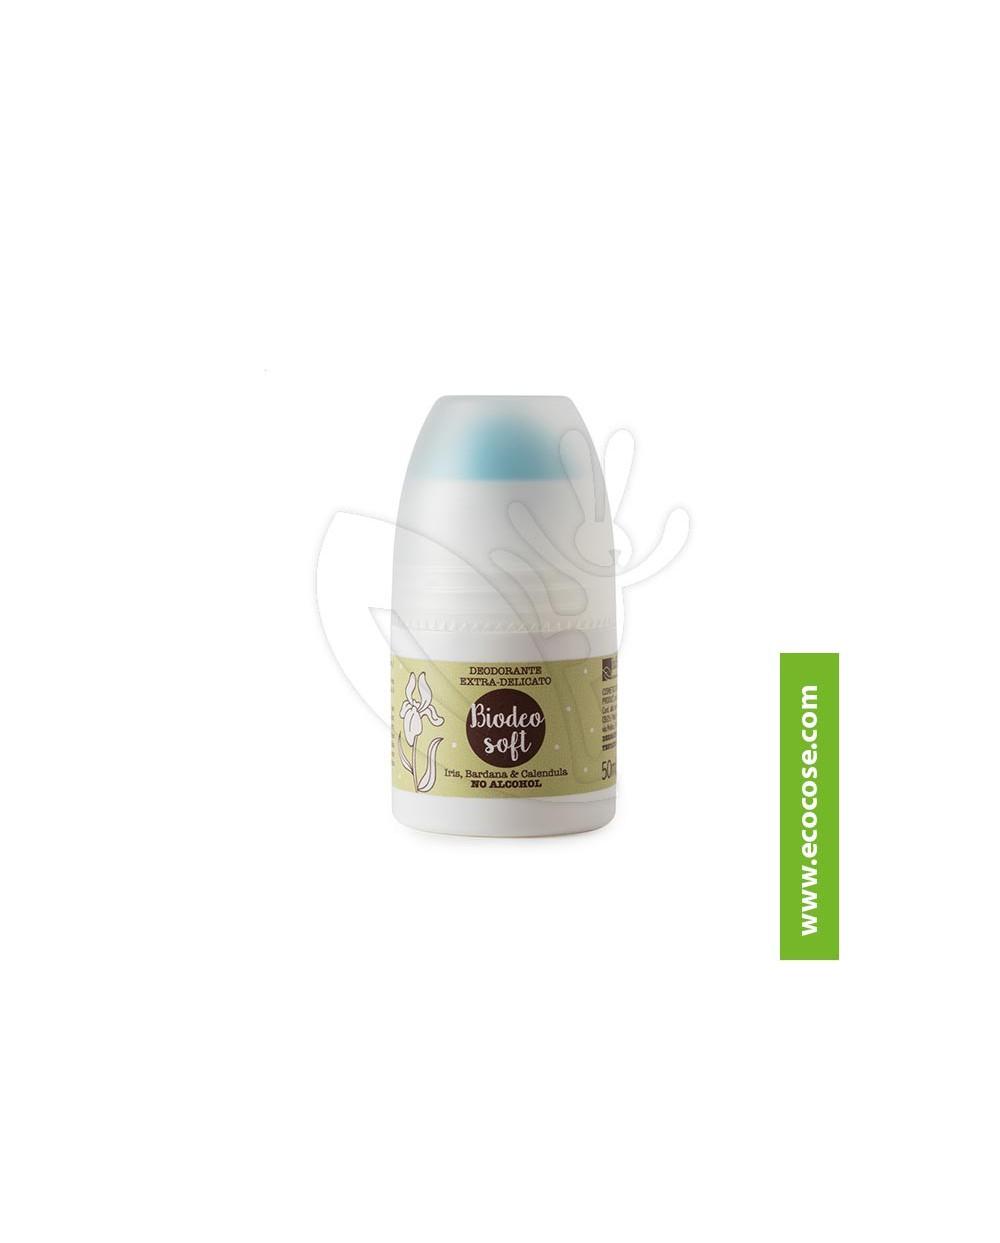 La Saponaria - Radici - Biodeo Soft Iris, Bardana, Calendula